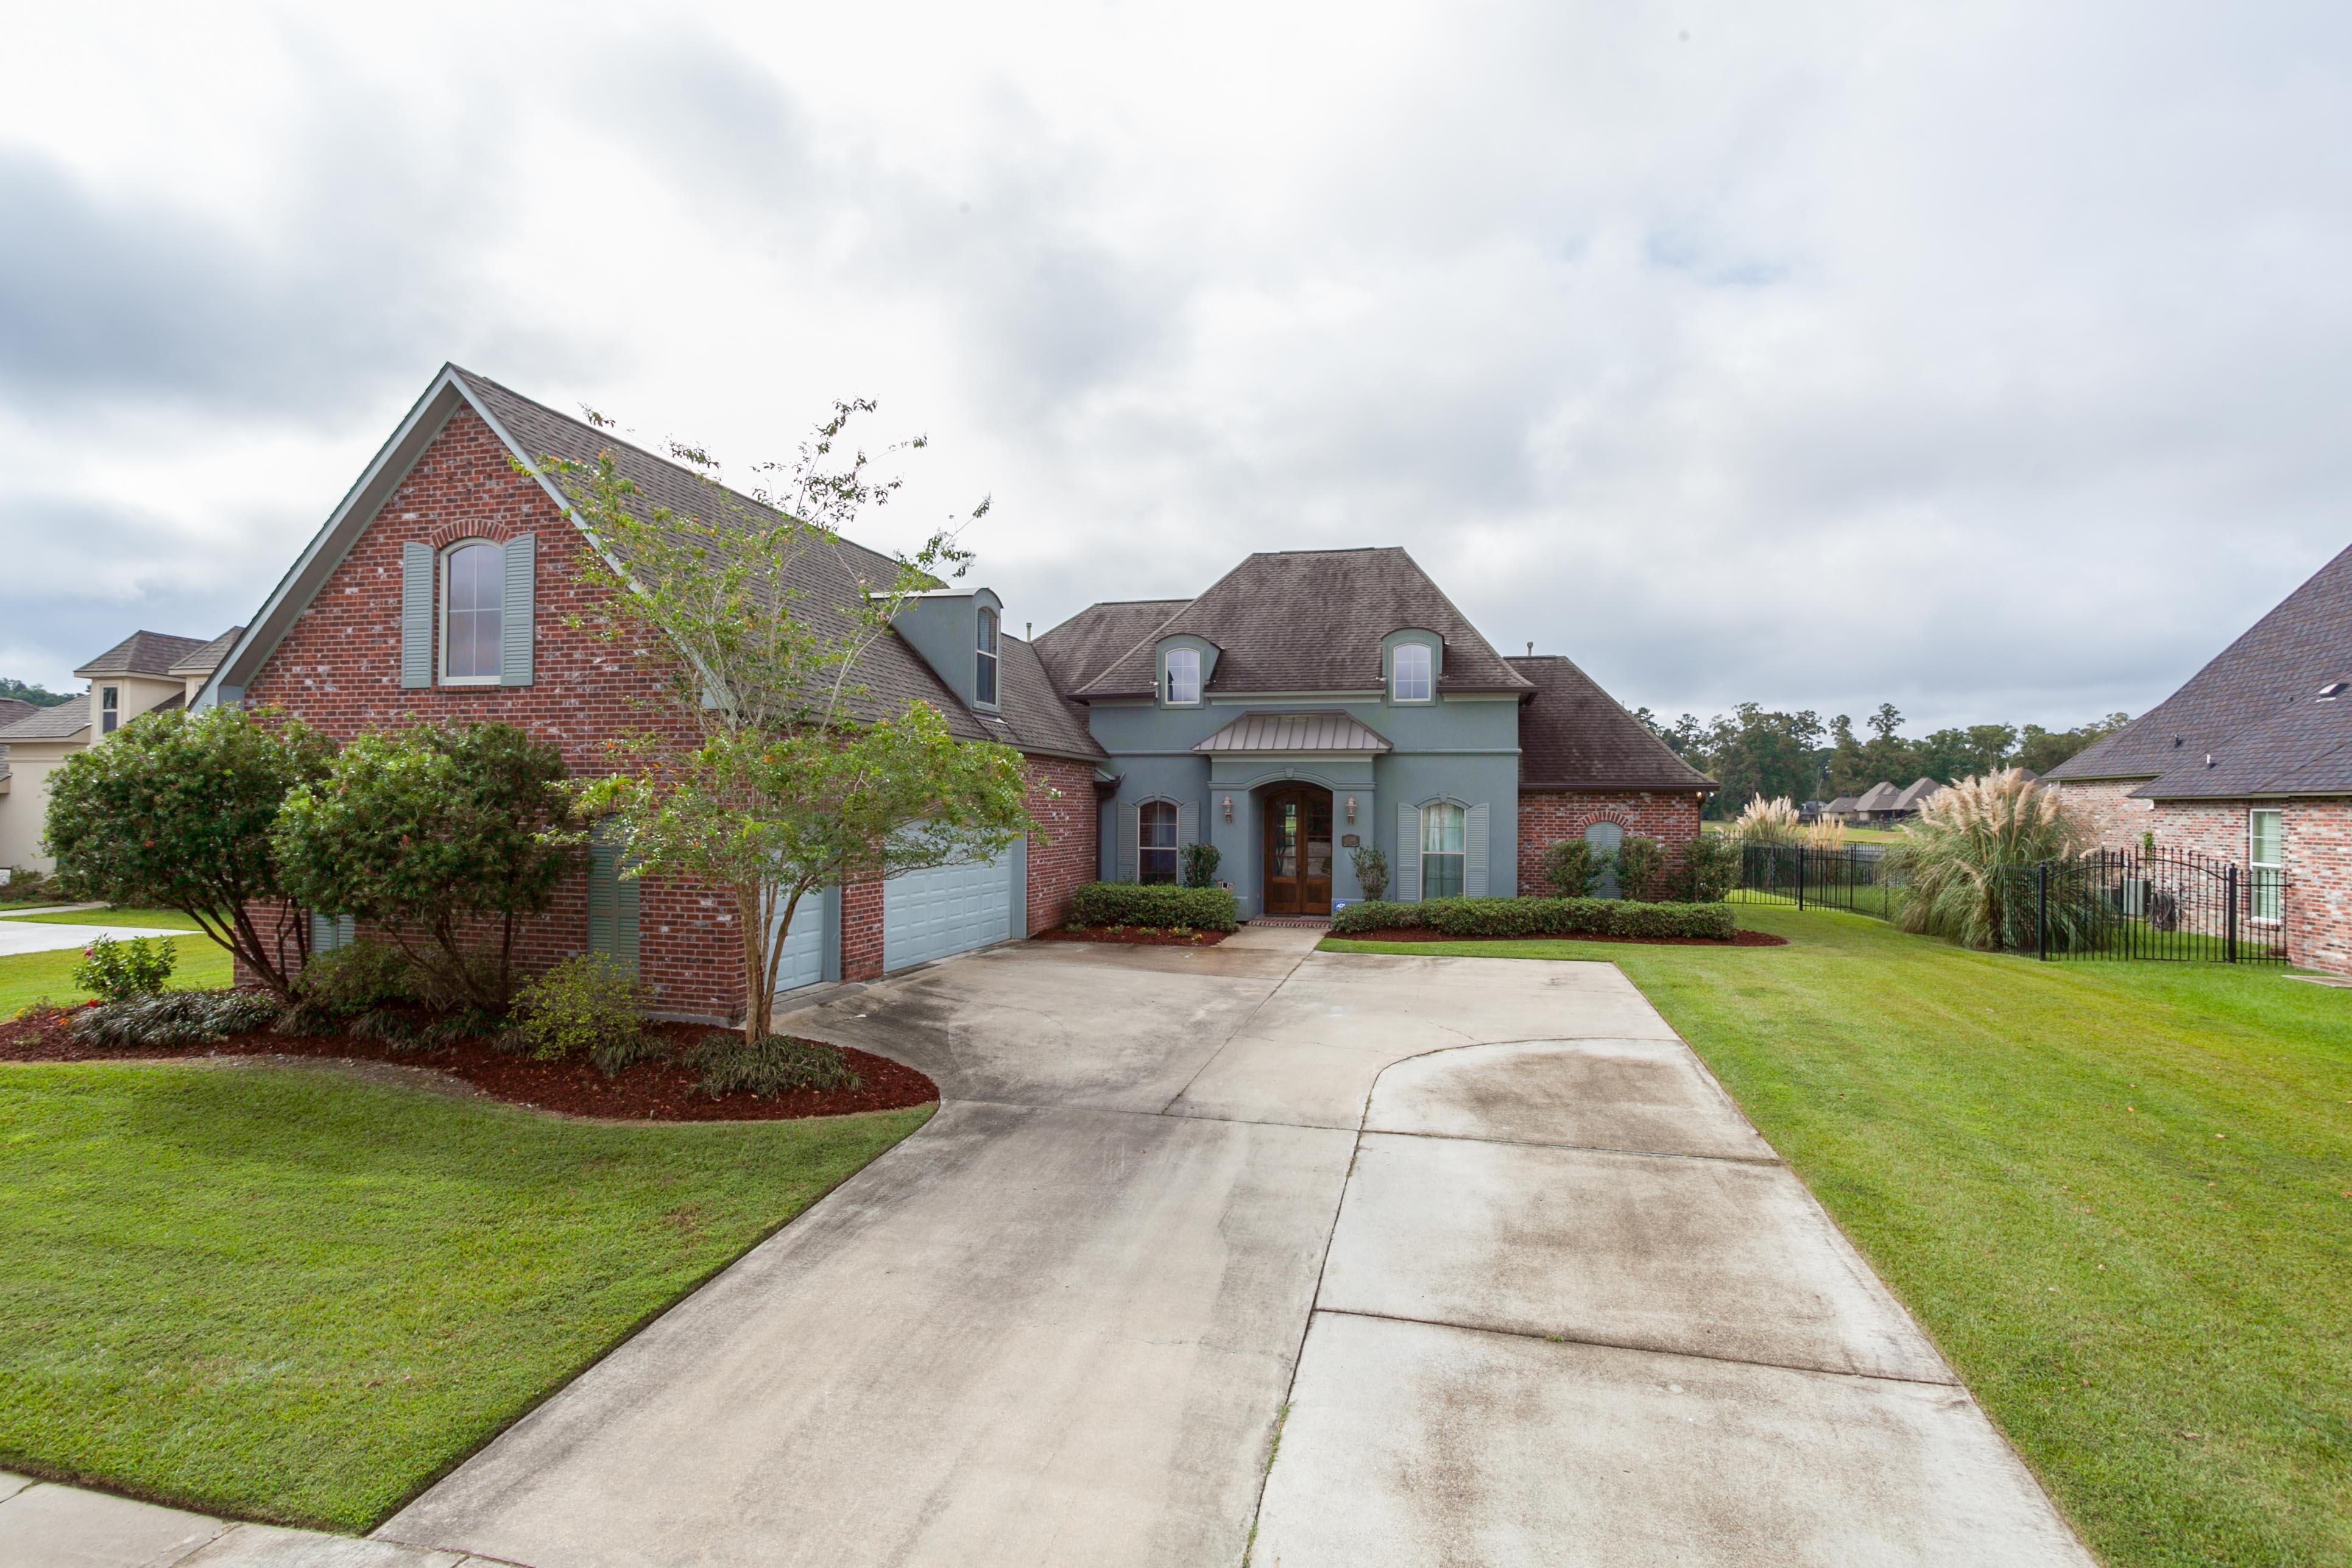 17248 Tugwell Ln, Greenwell Springs, Louisiana 70739